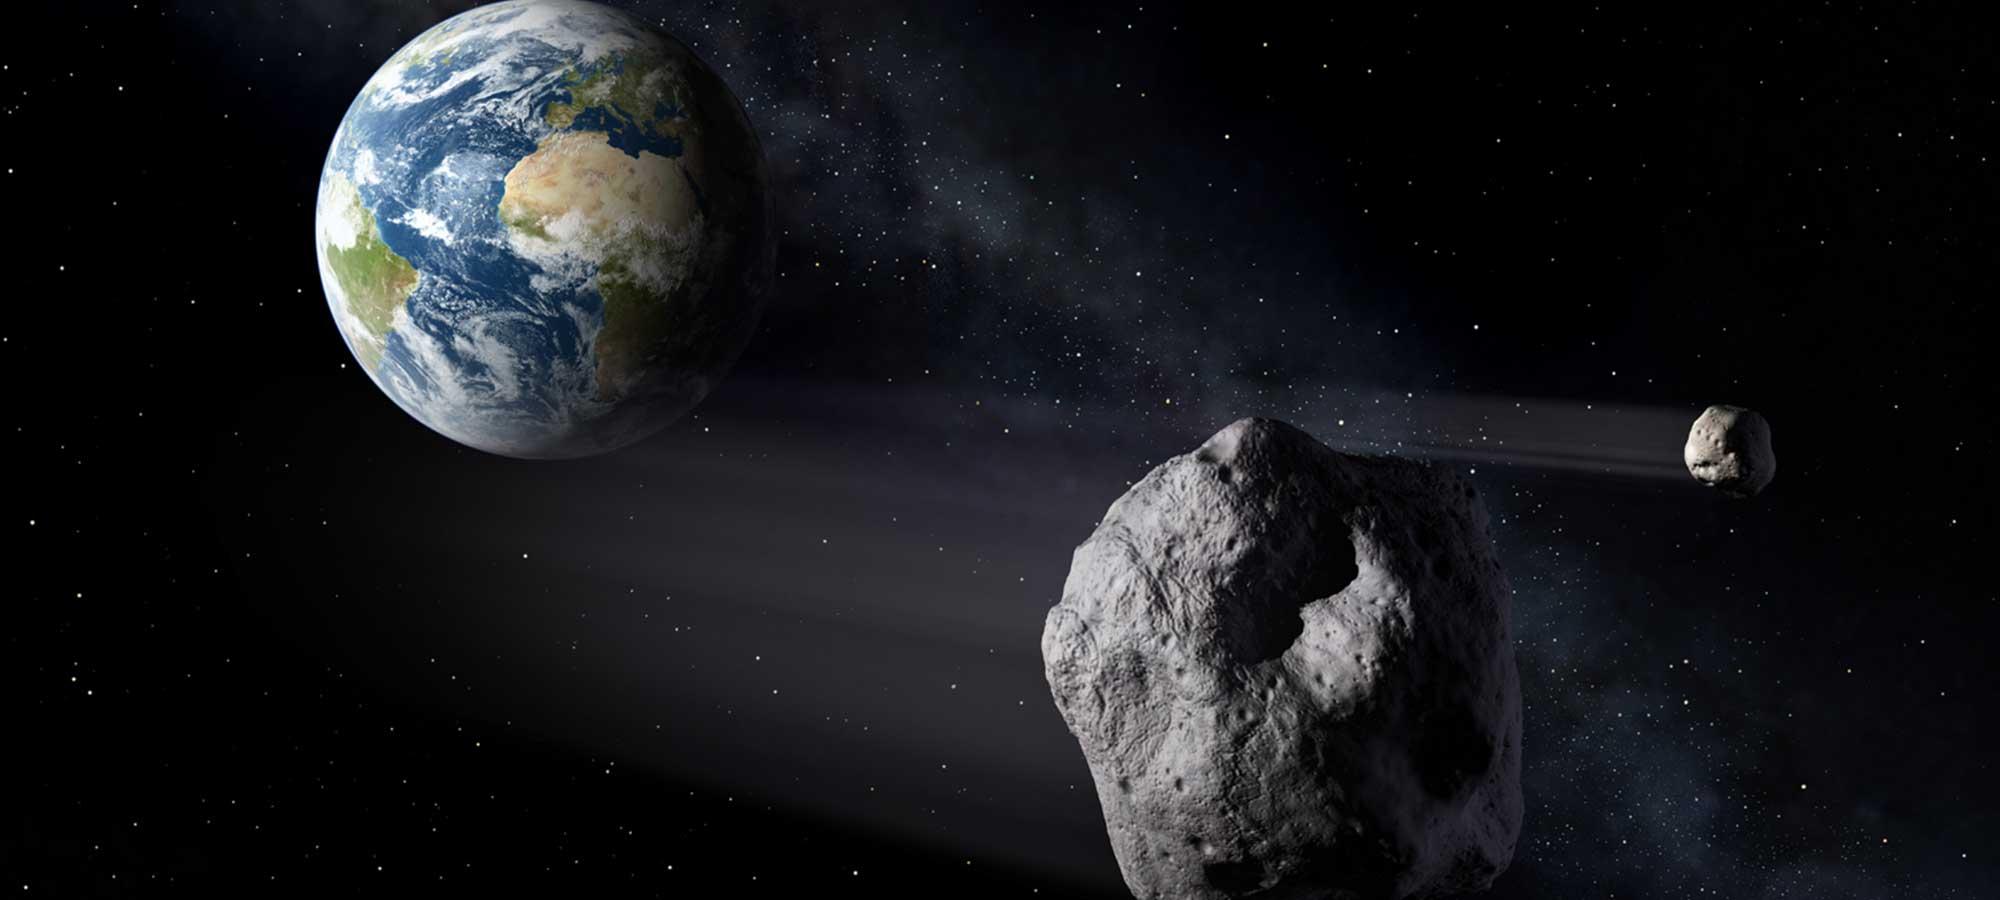 Meteorit, meteor, asteroid och komet